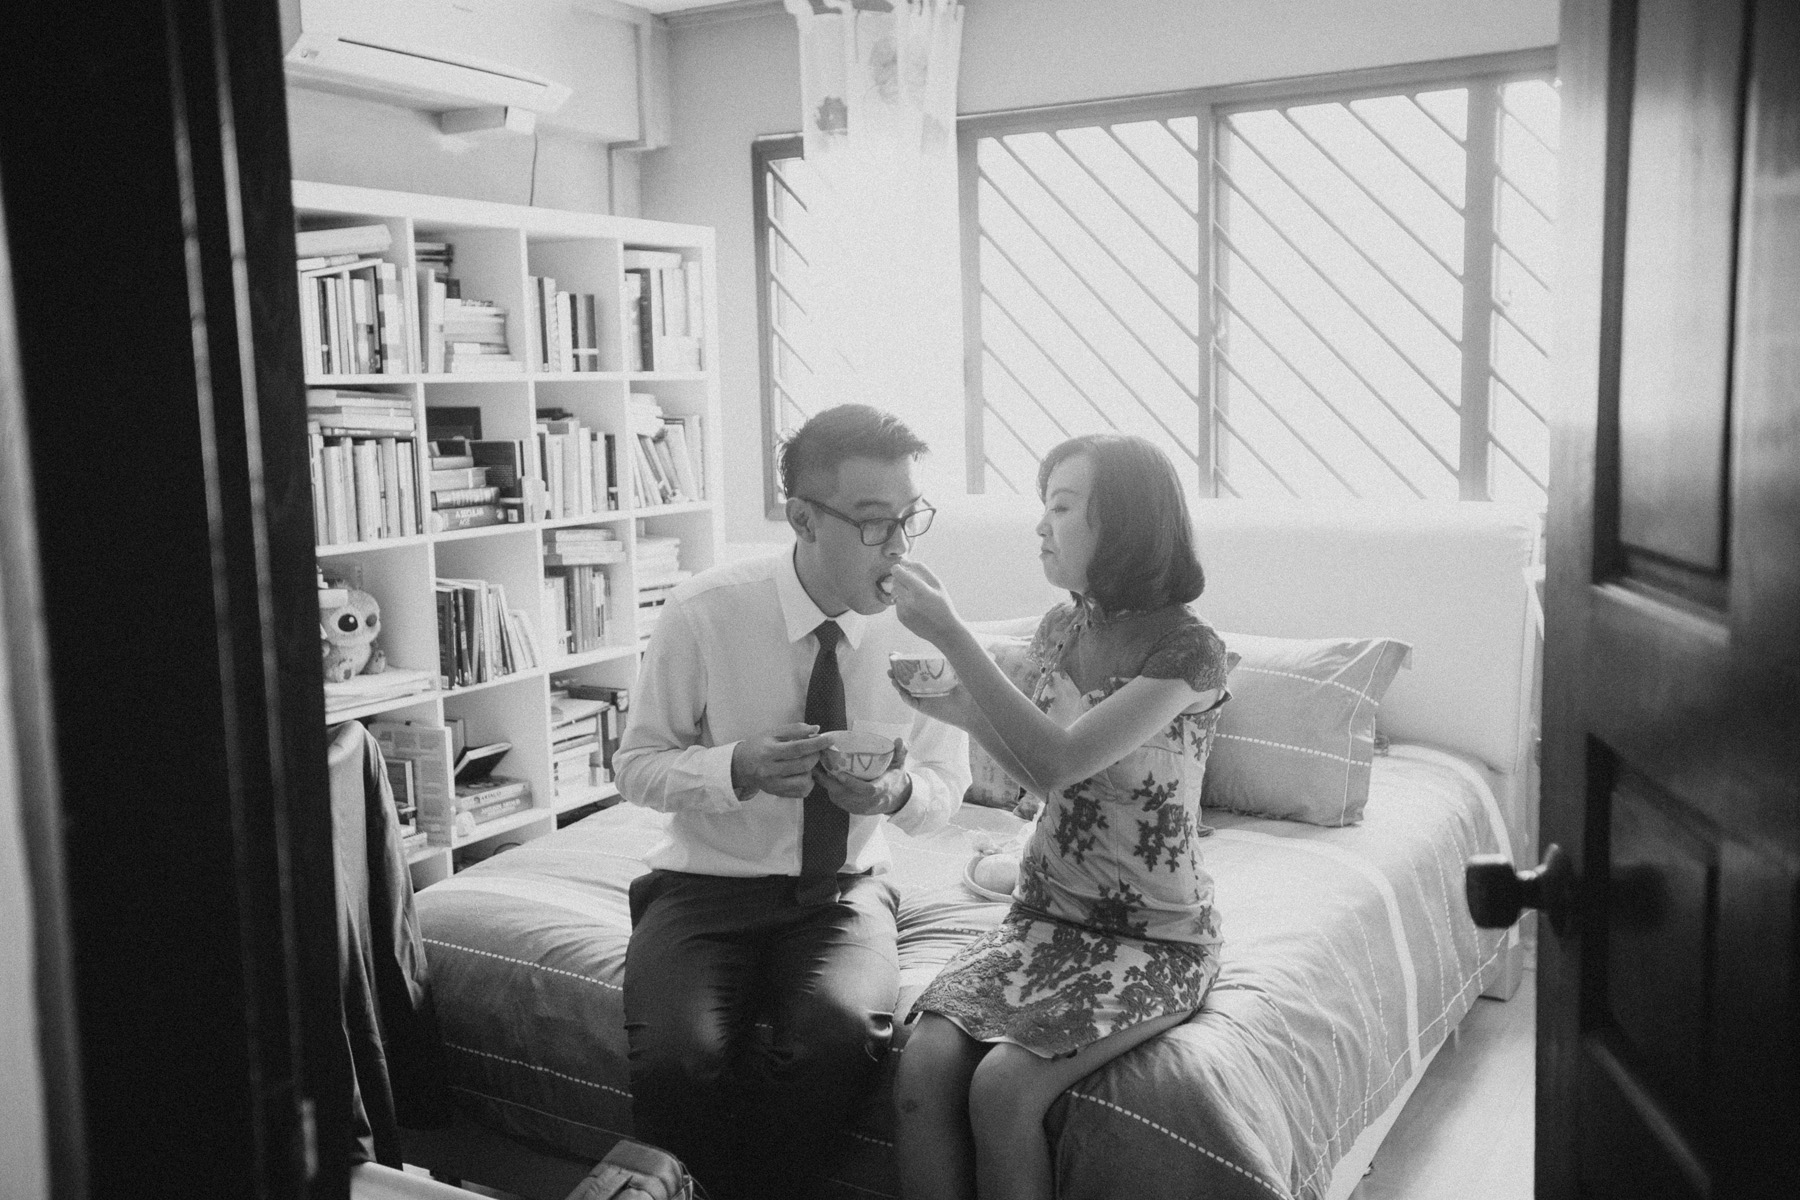 singapore-wedding-travel-photographer-faith-alvin-wedding-wmt-20.jpg